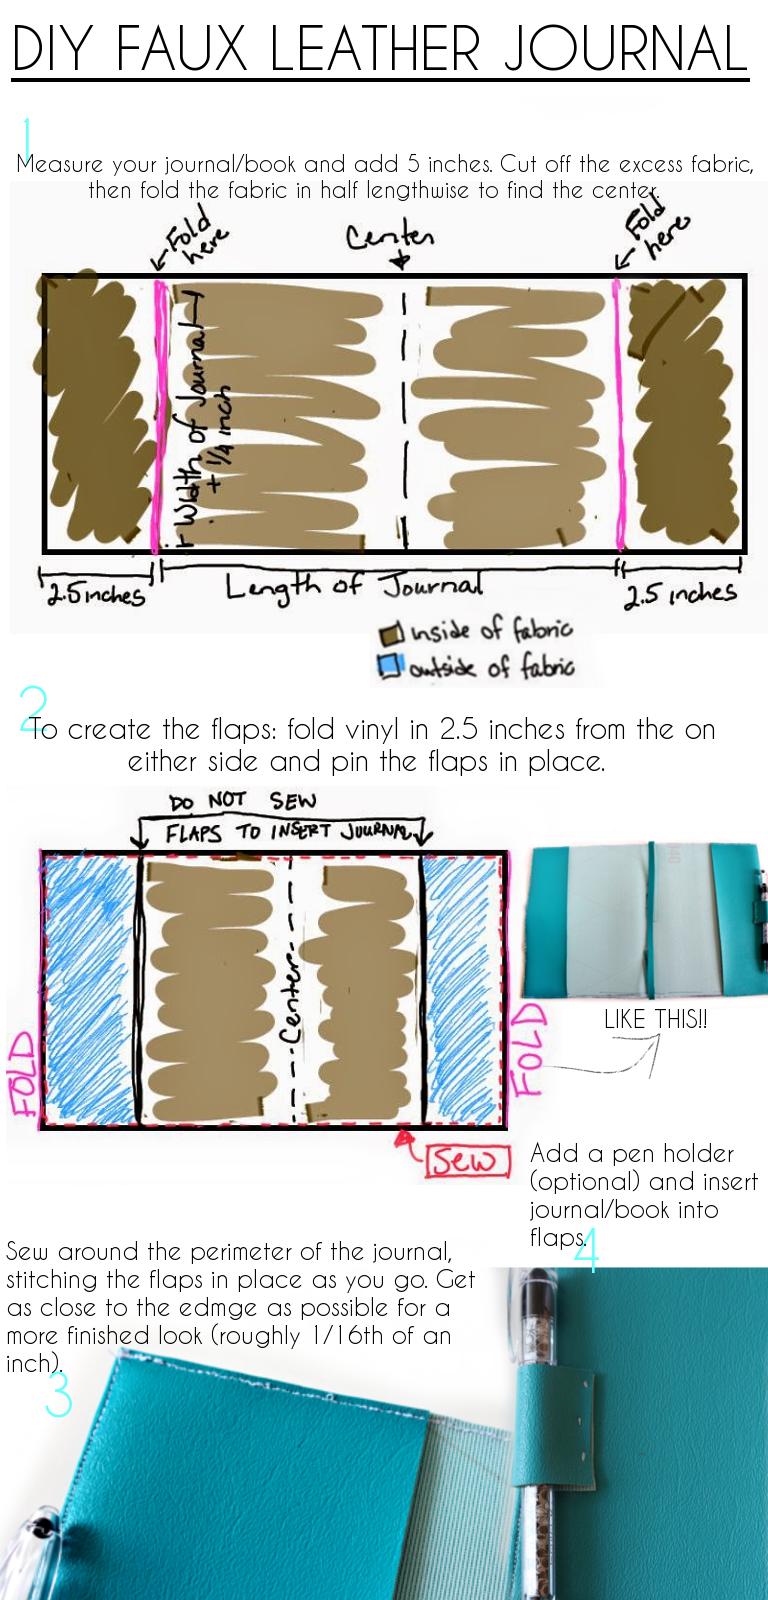 22++ Diy faux leather journal ideas